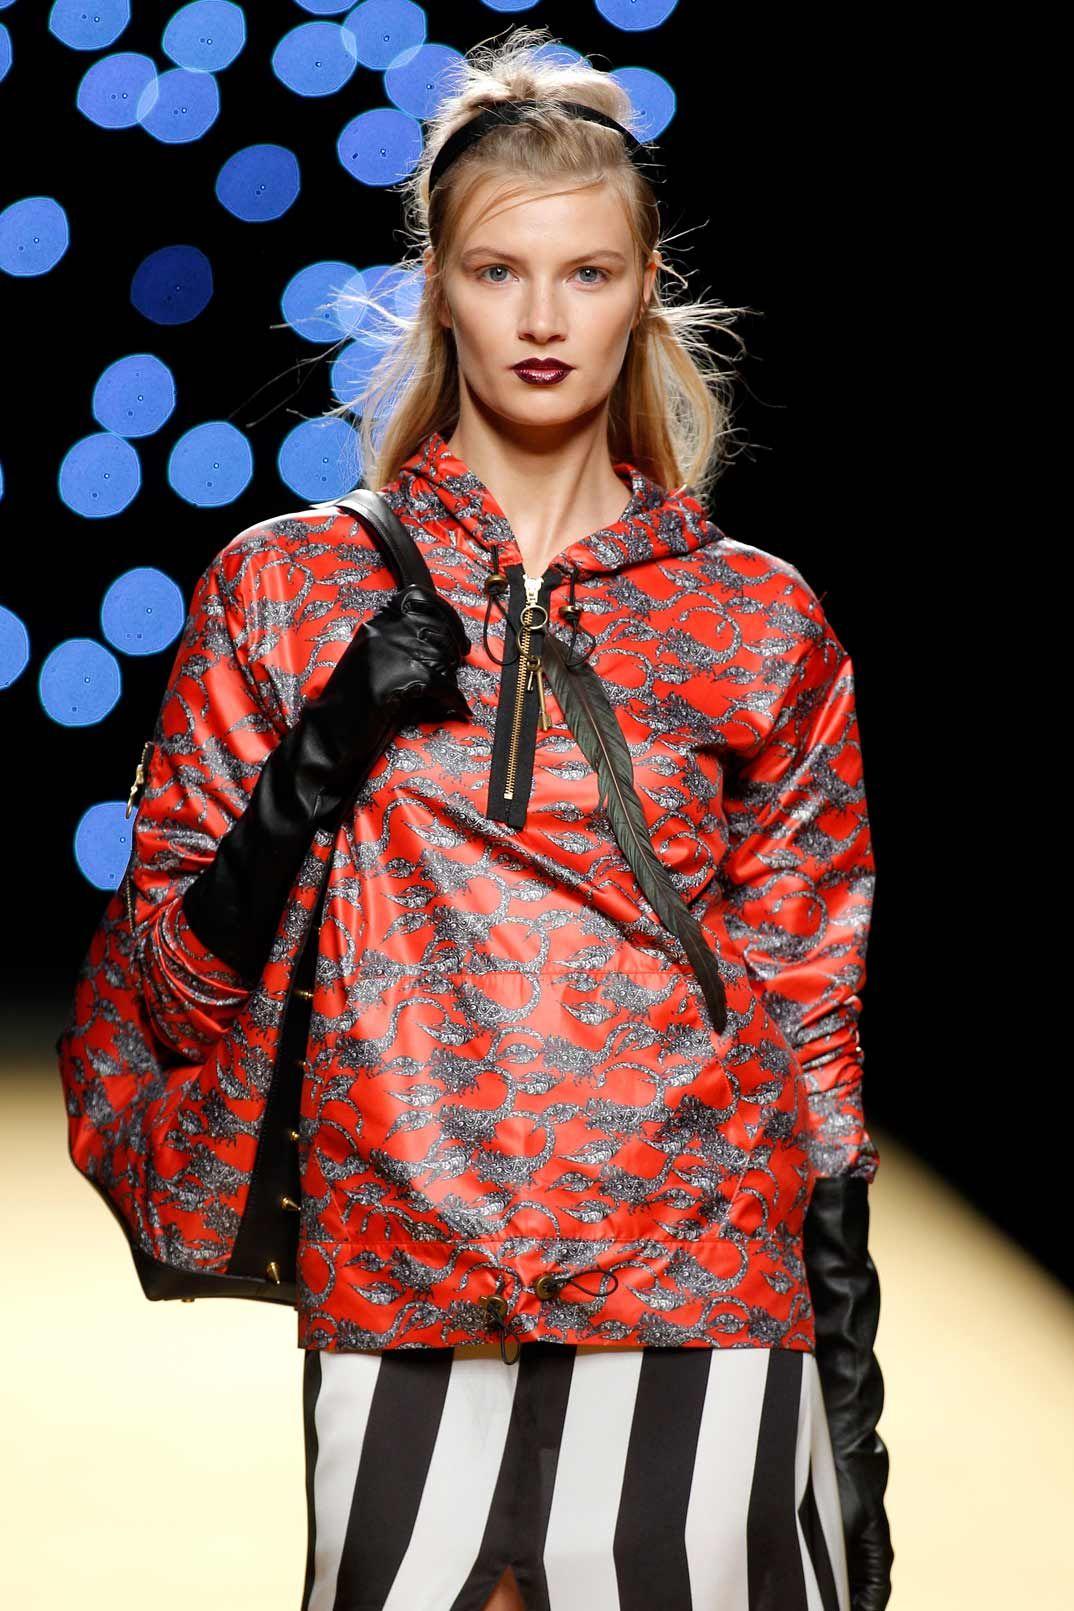 Mercedes Benz Fashion Week Madrid: Juanjo Oliva Primavera-Verano 2017